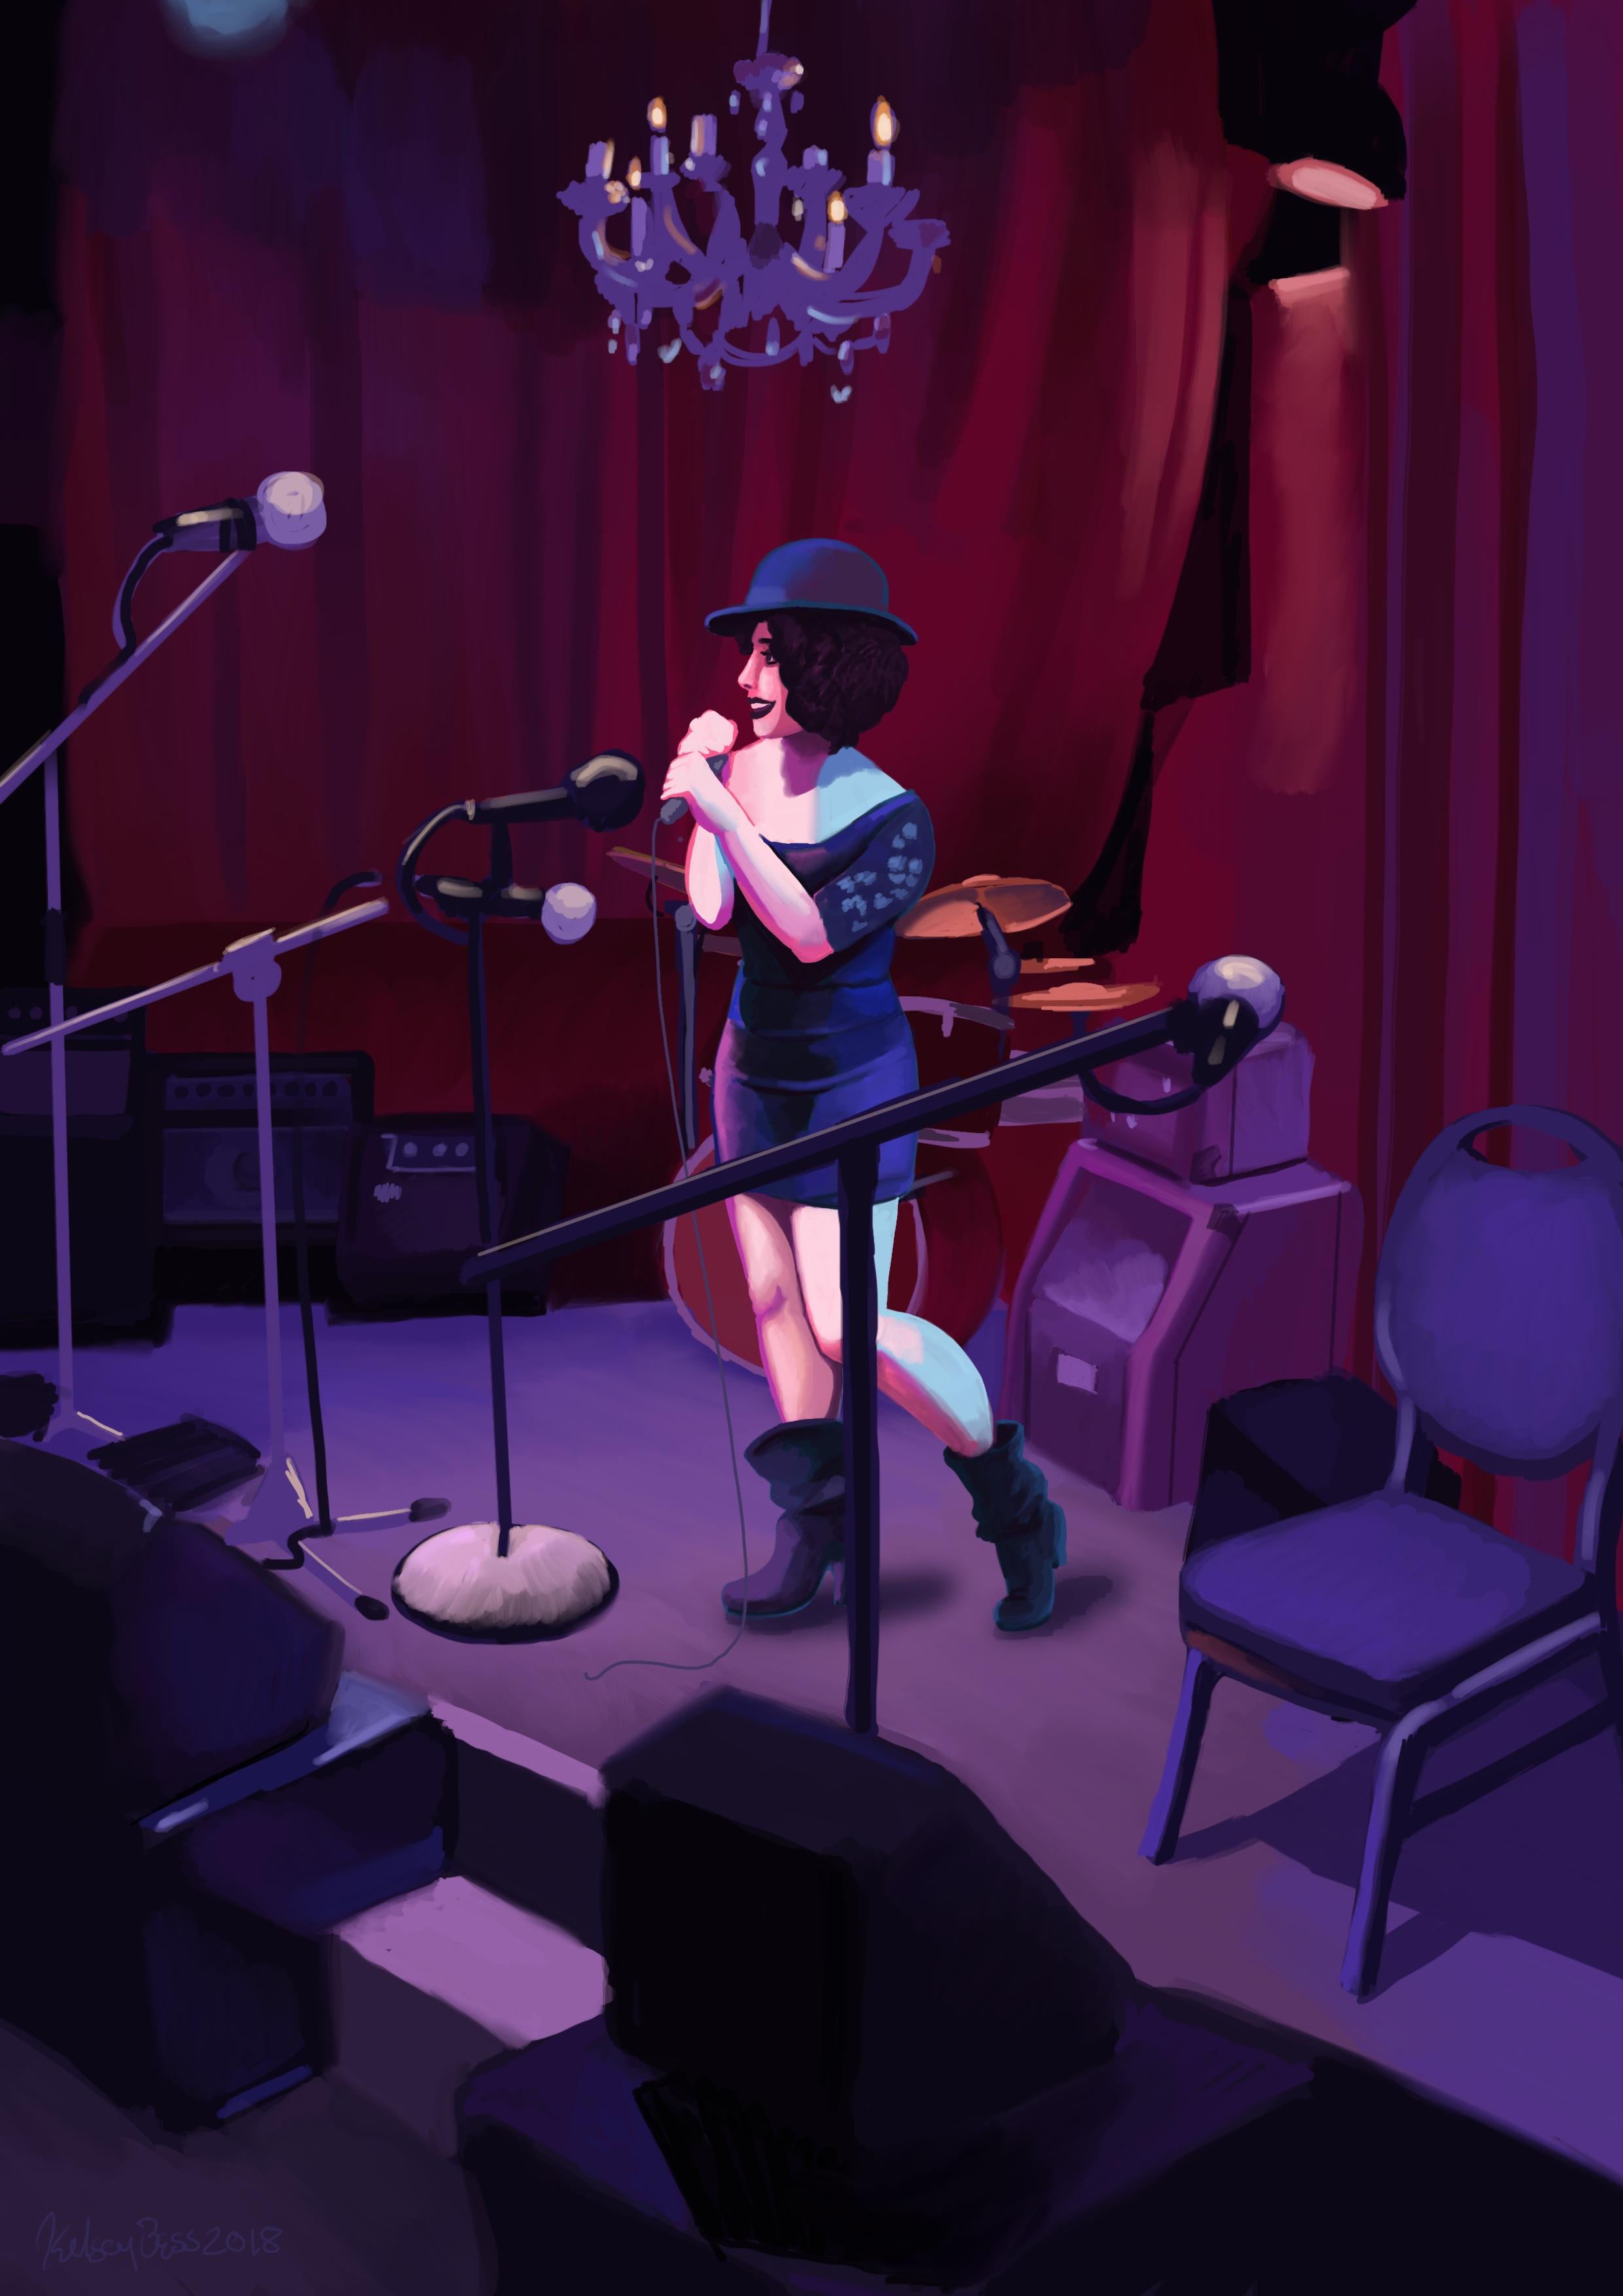 Tom_Petty_Concert.jpg